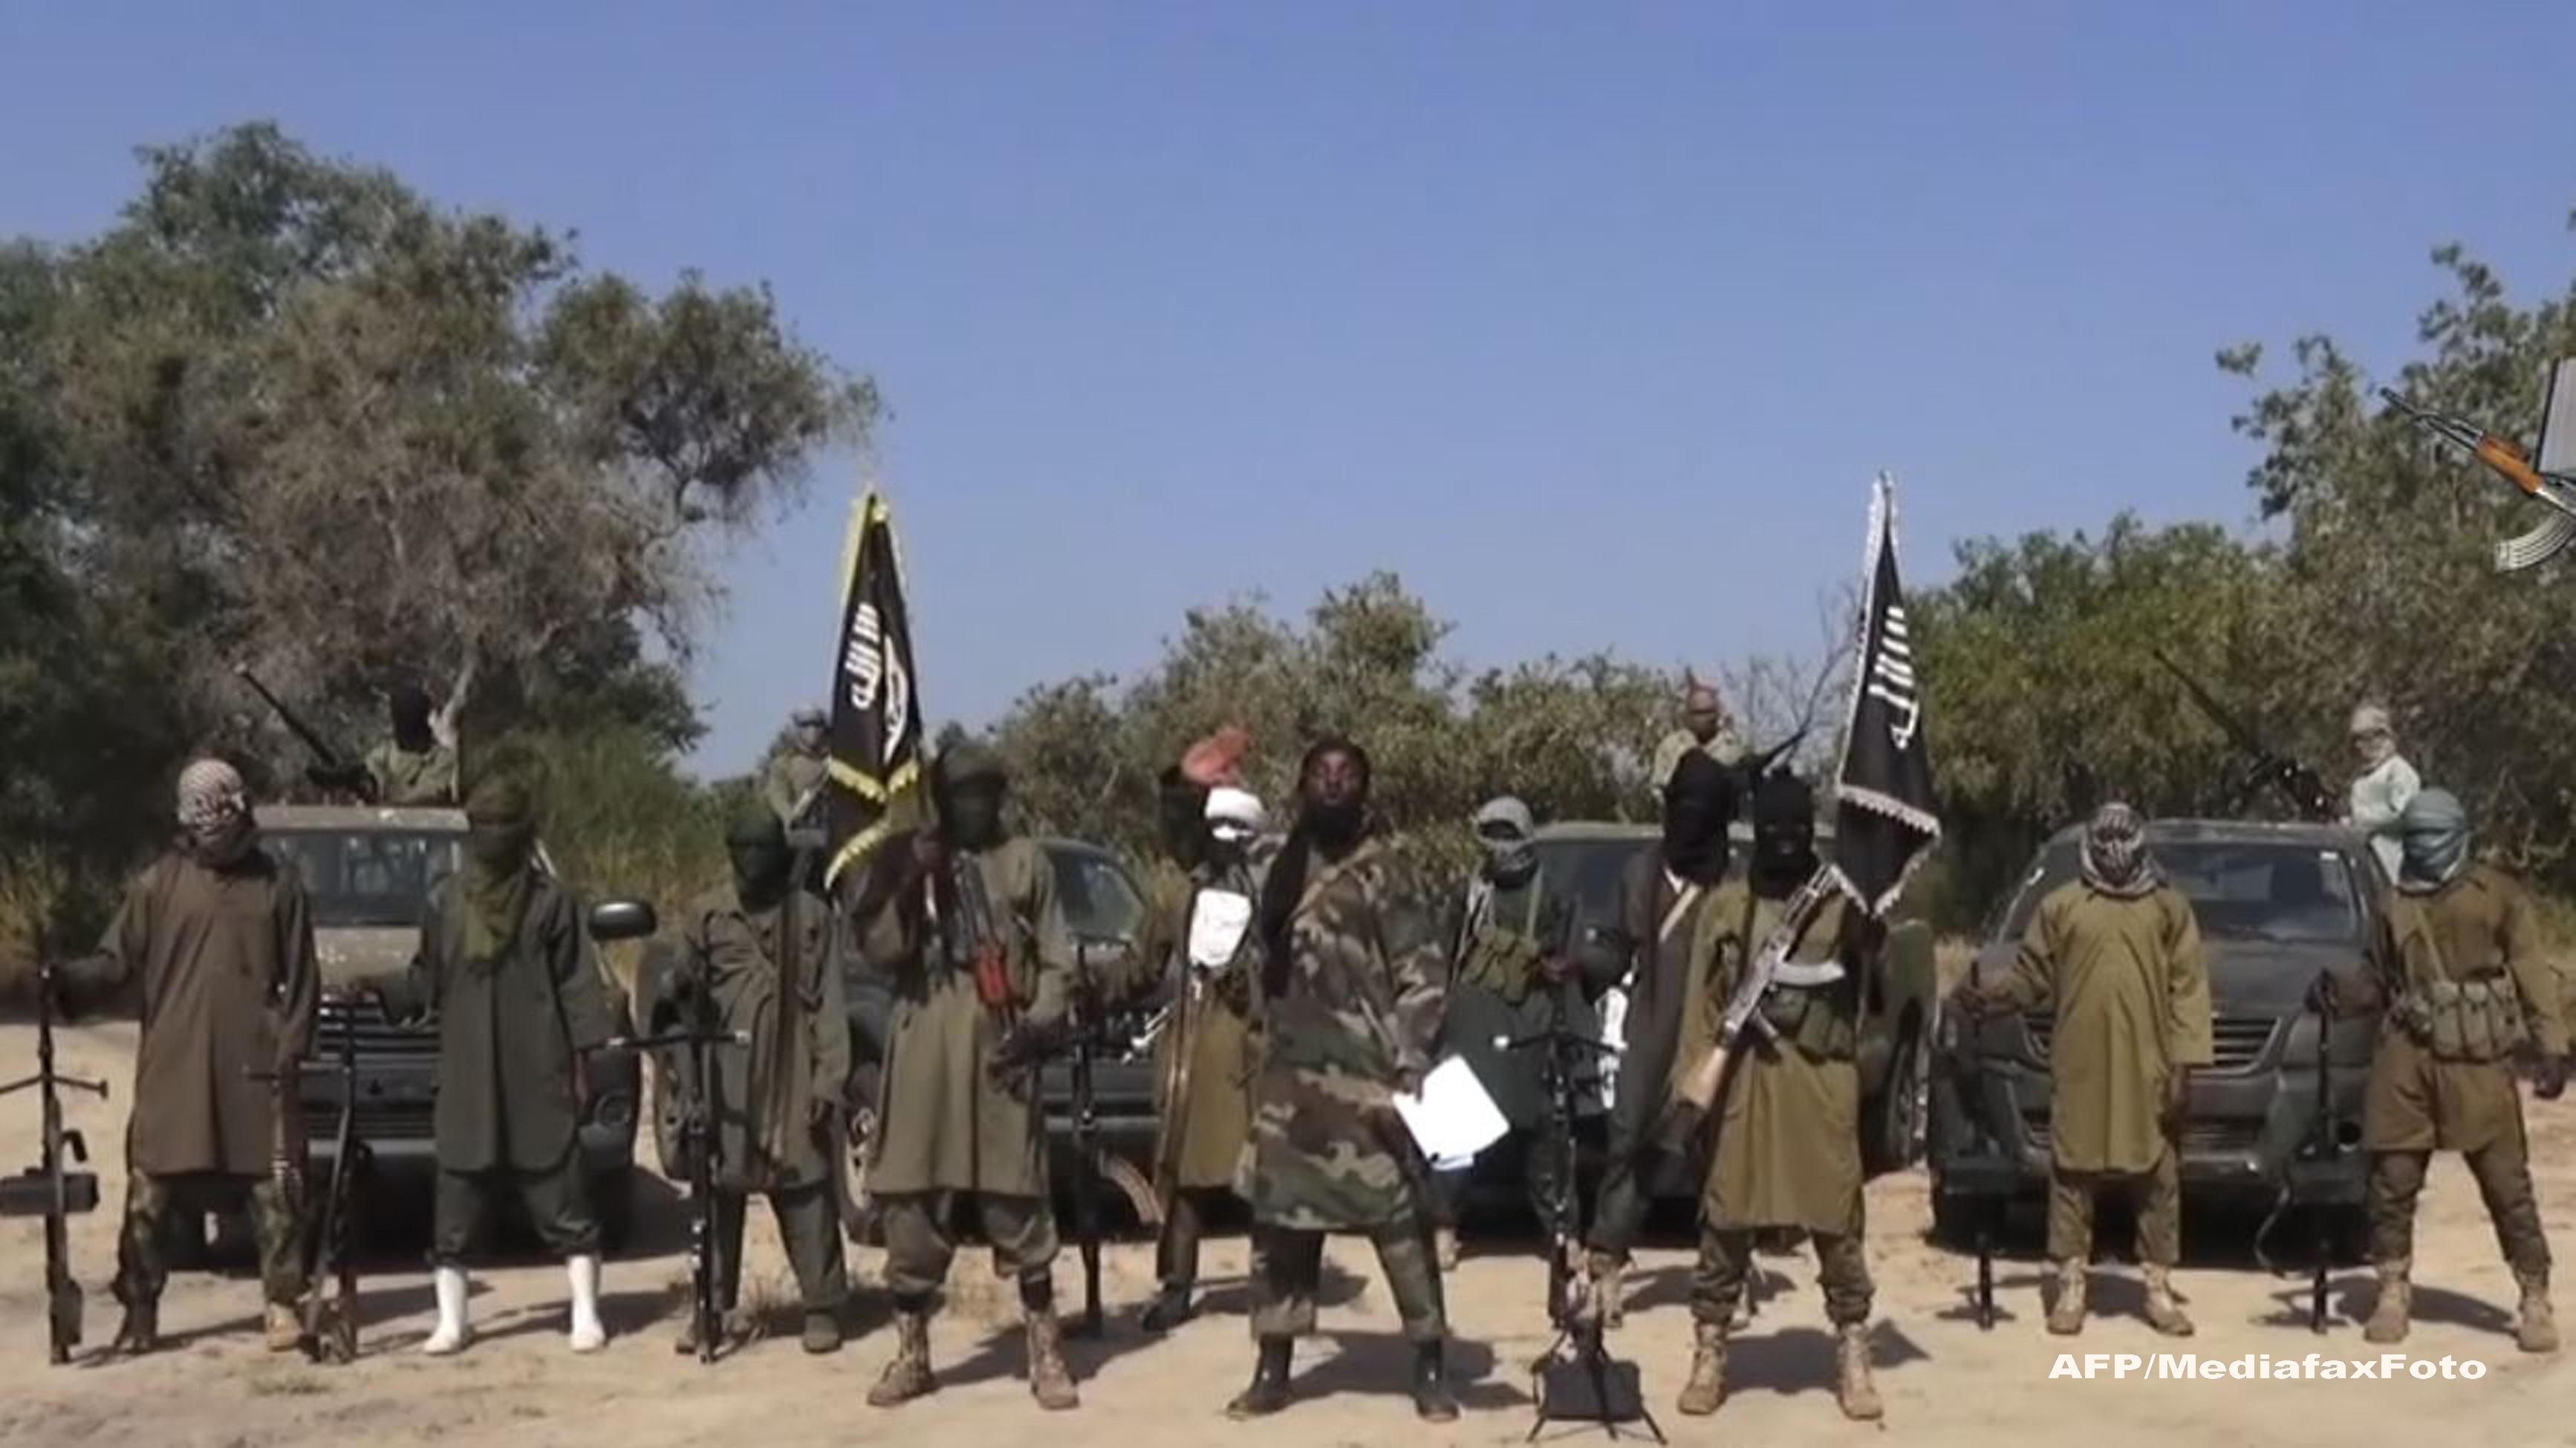 Aproximativ 20 de morti si 90 de raniti intr-un atentat la o moschee din Nigeria. Masacrul poarta insemnele Boko Haram